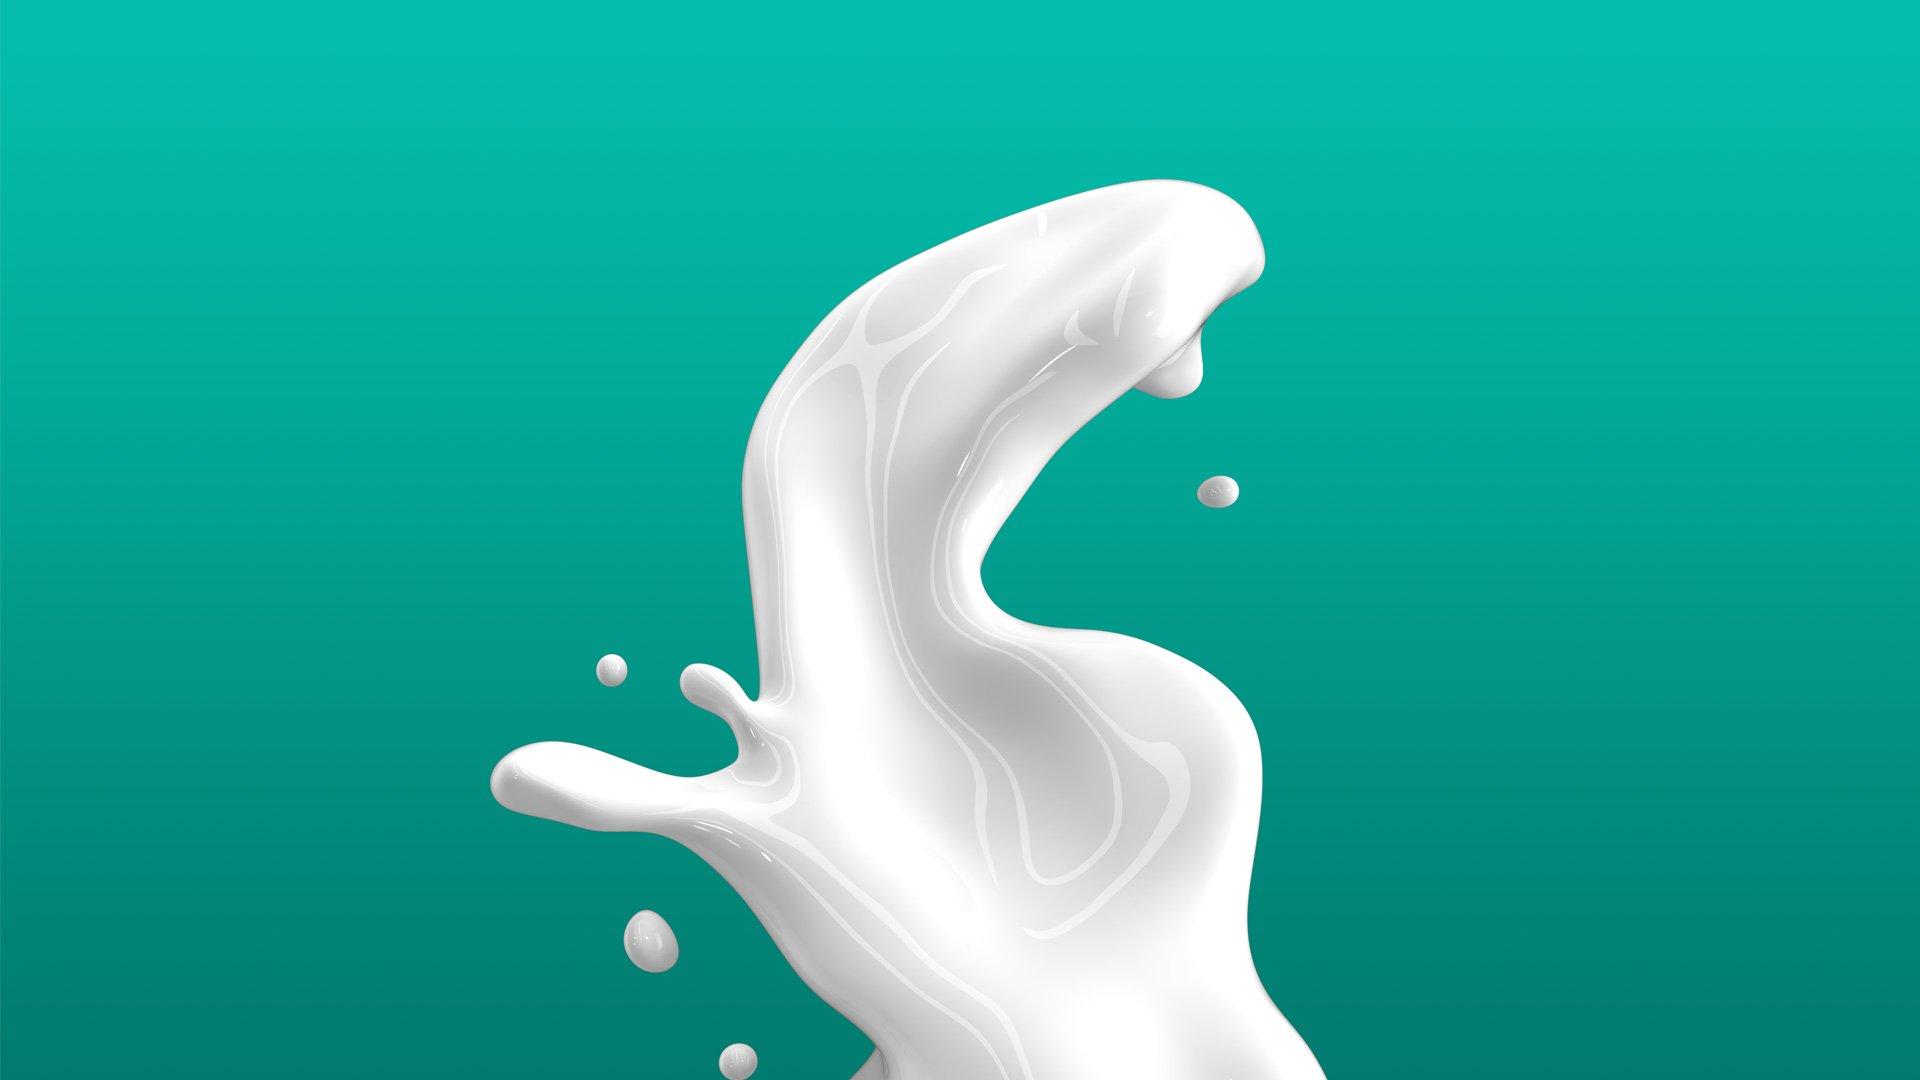 melk-botten